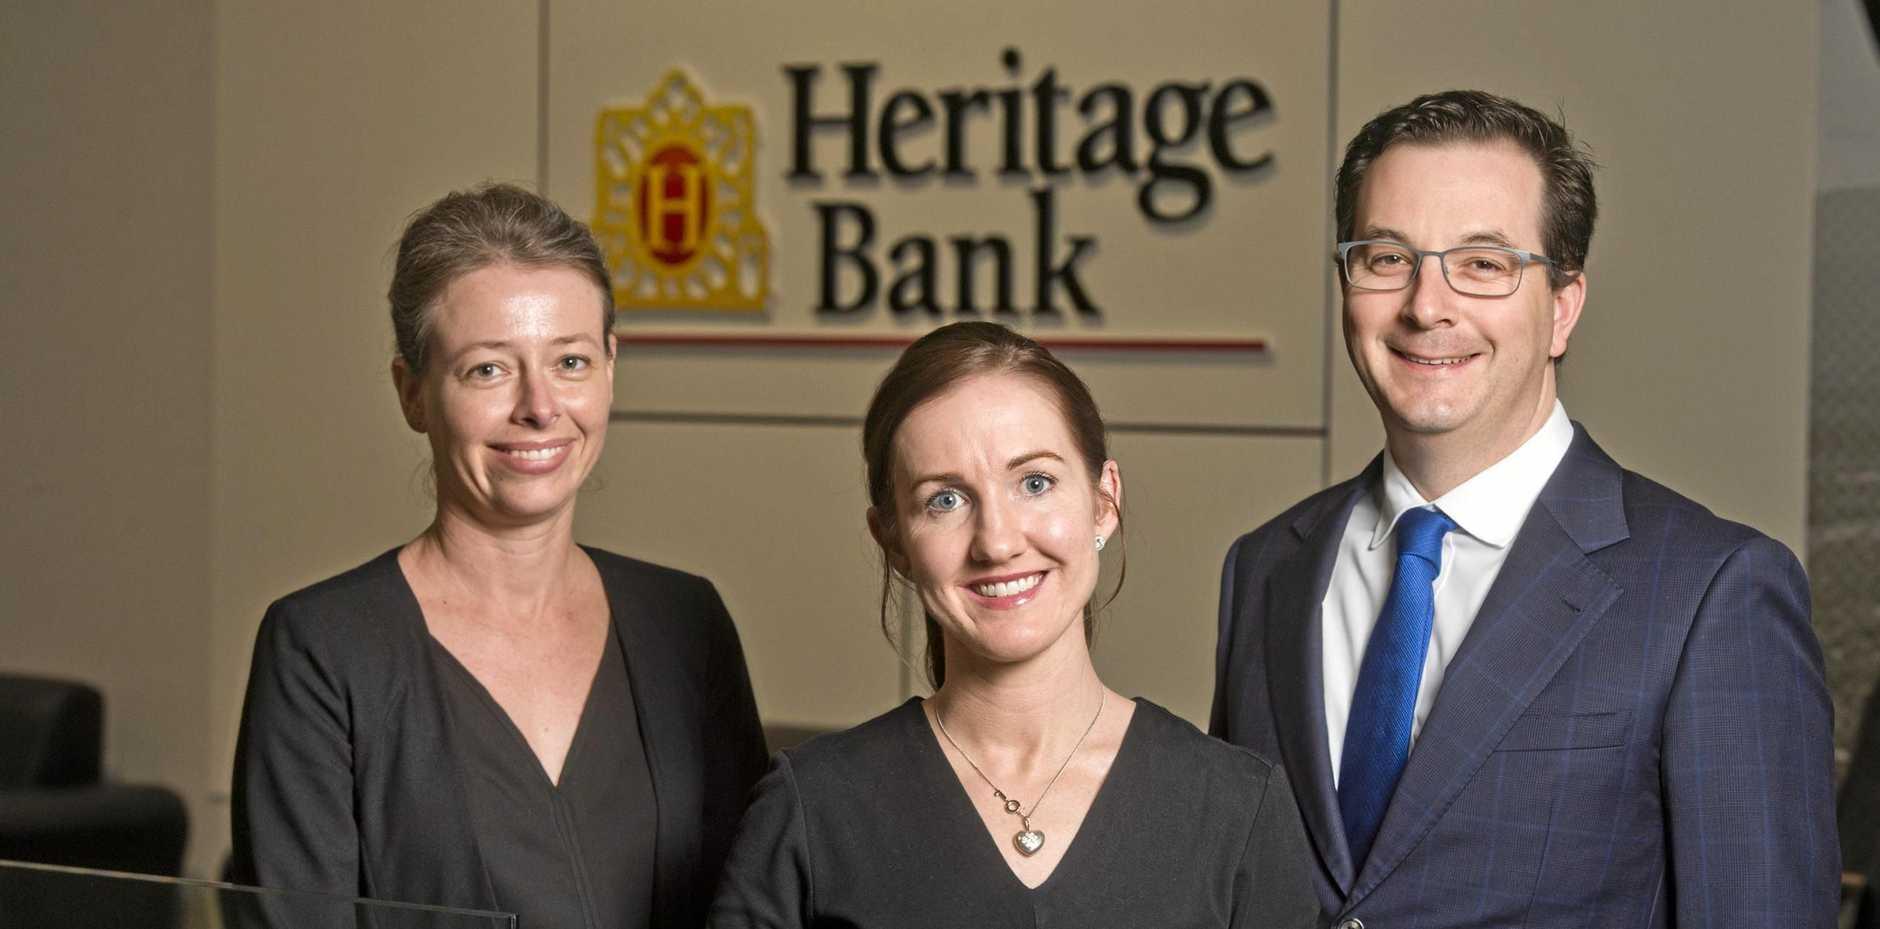 EXECUTIVES: Enjoying life at Heritage Bank are (from left) Alyssa Egerton, Bernadette Murphy and Dan Dredge.